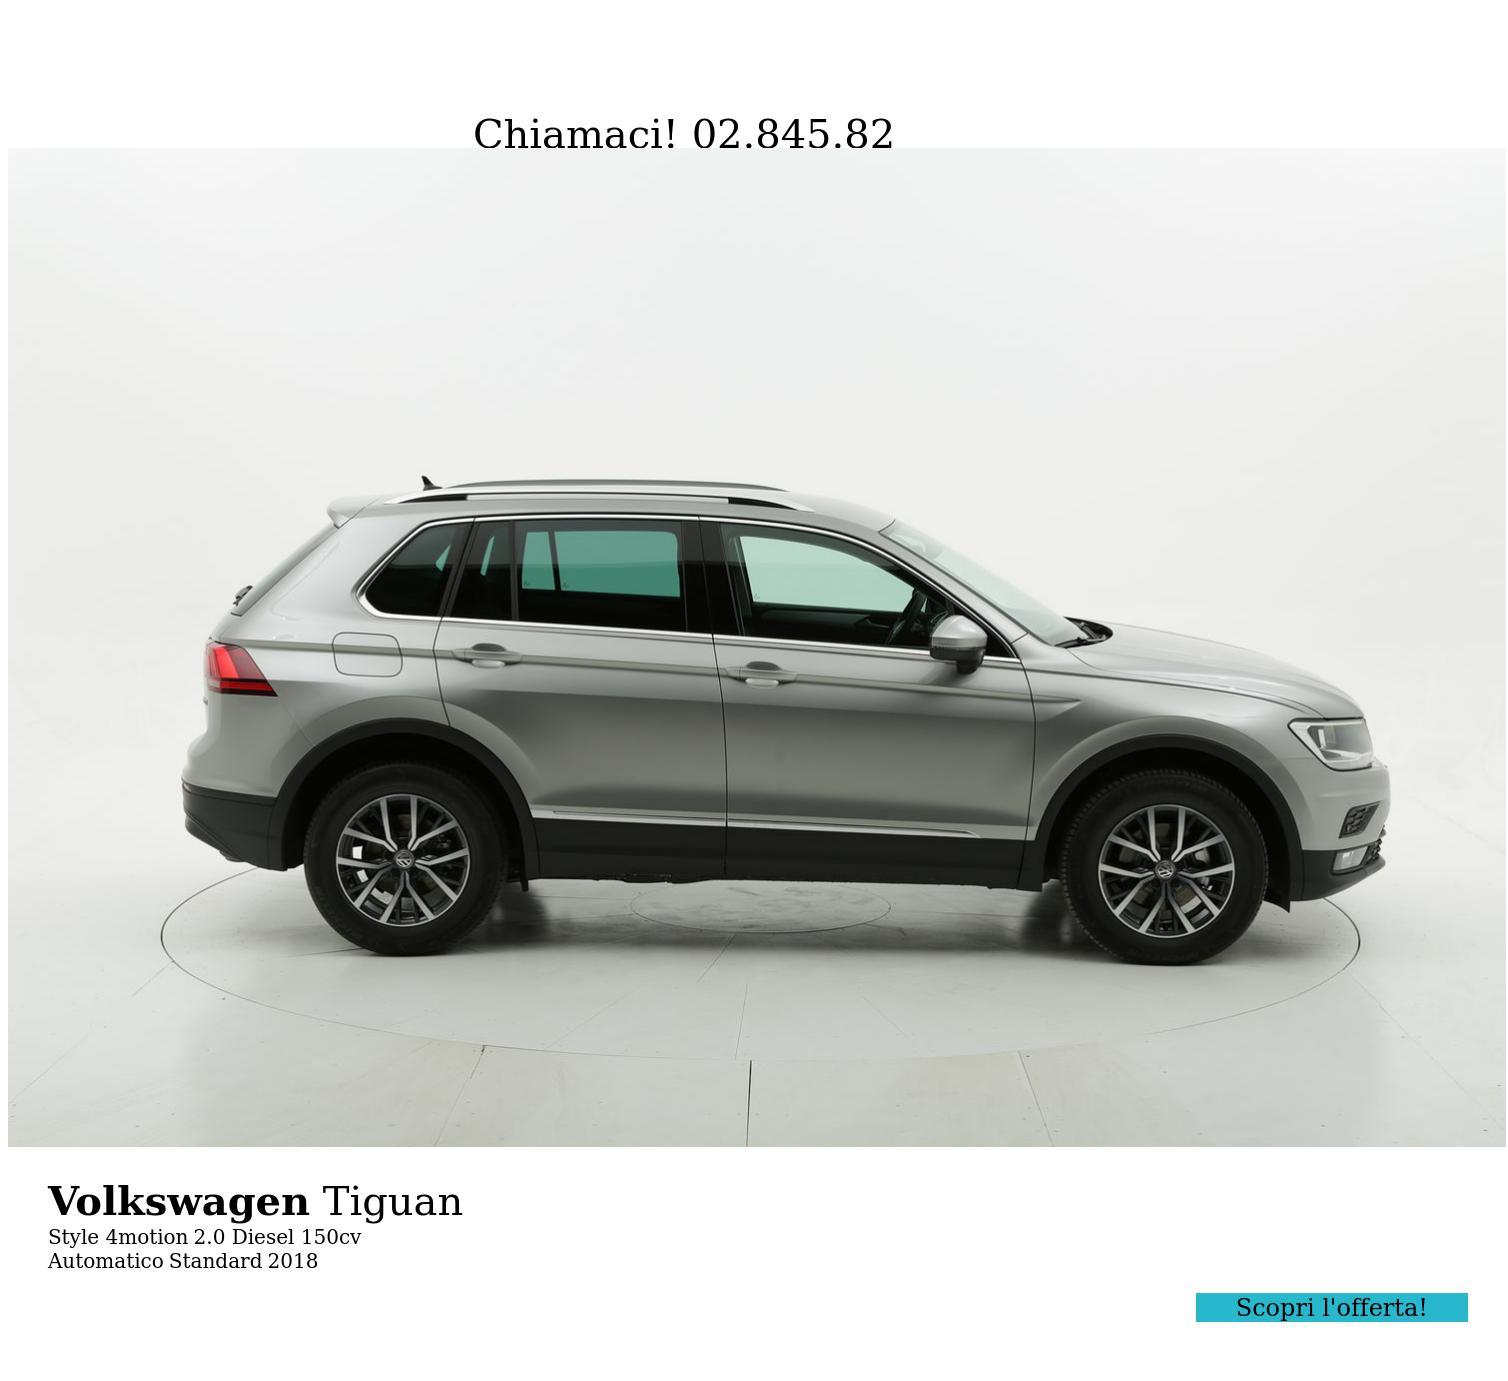 Volkswagen Tiguan Style 4motion km 0 diesel grigia | brumbrum